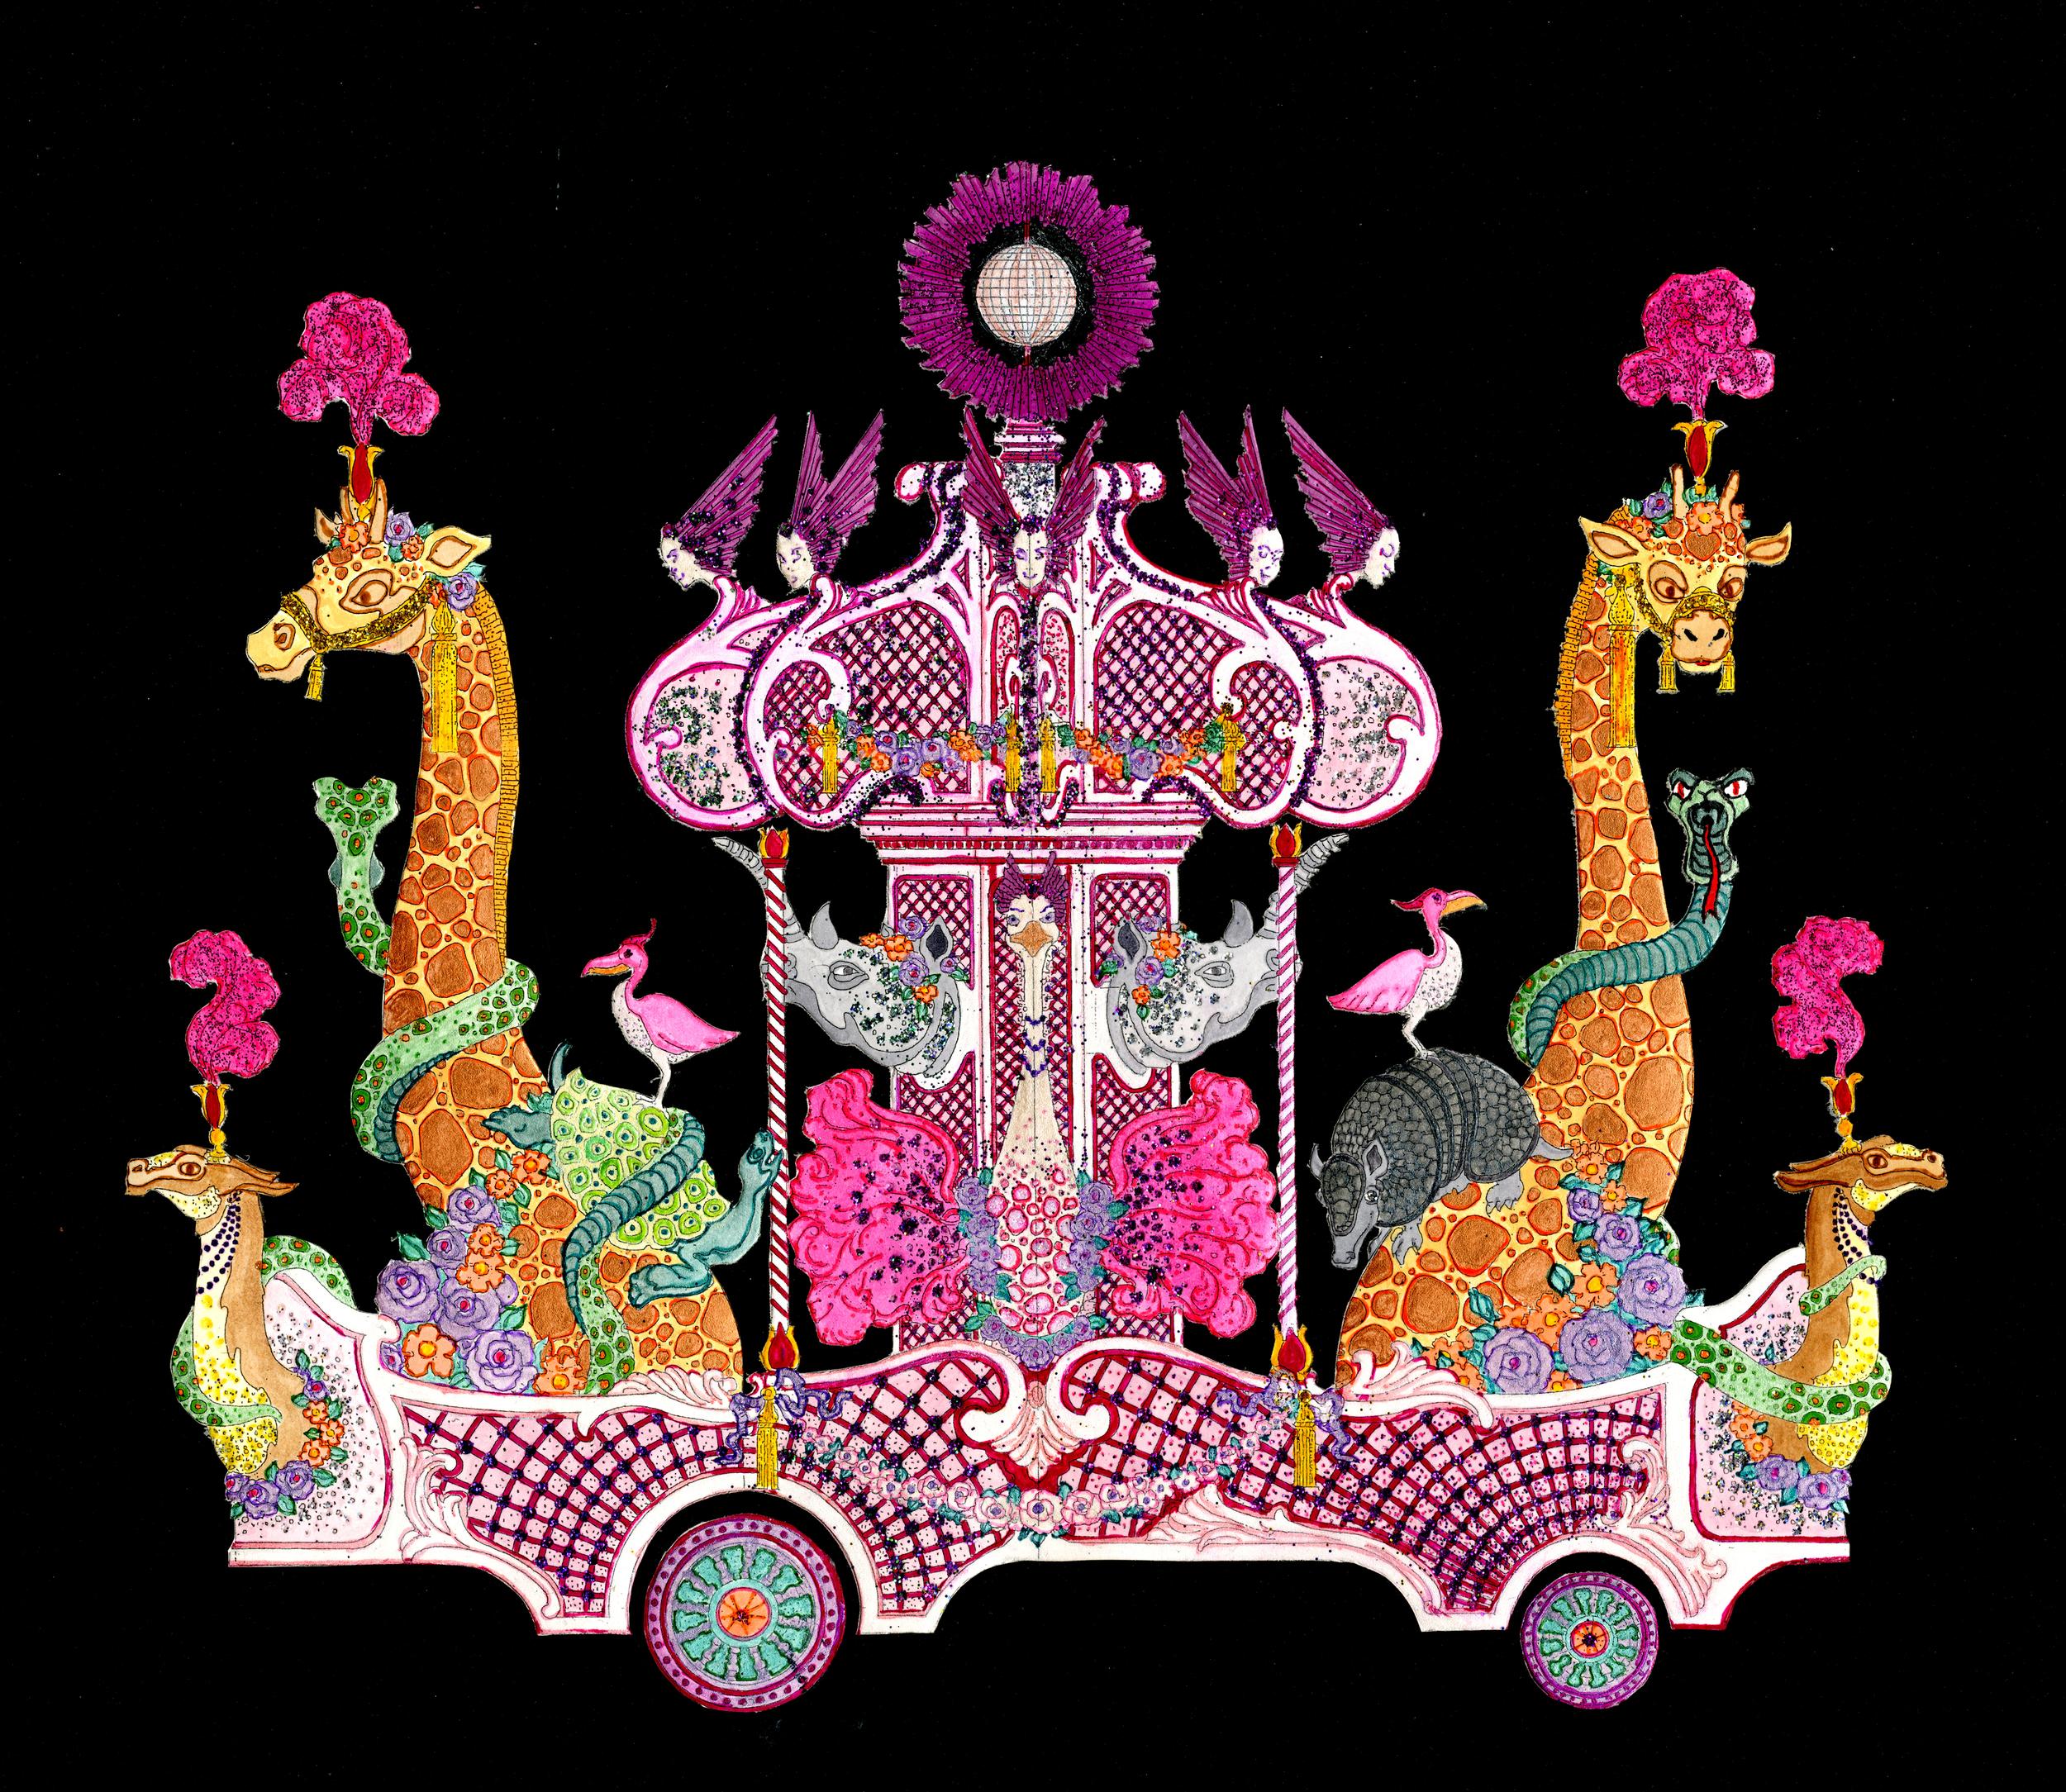 "BARNUM & BAILEY CIRCUS FLOAT  Design by: Eduardo Sicangco Paint: Jamie DeHay Scale: 3/8"" = 1'0"""